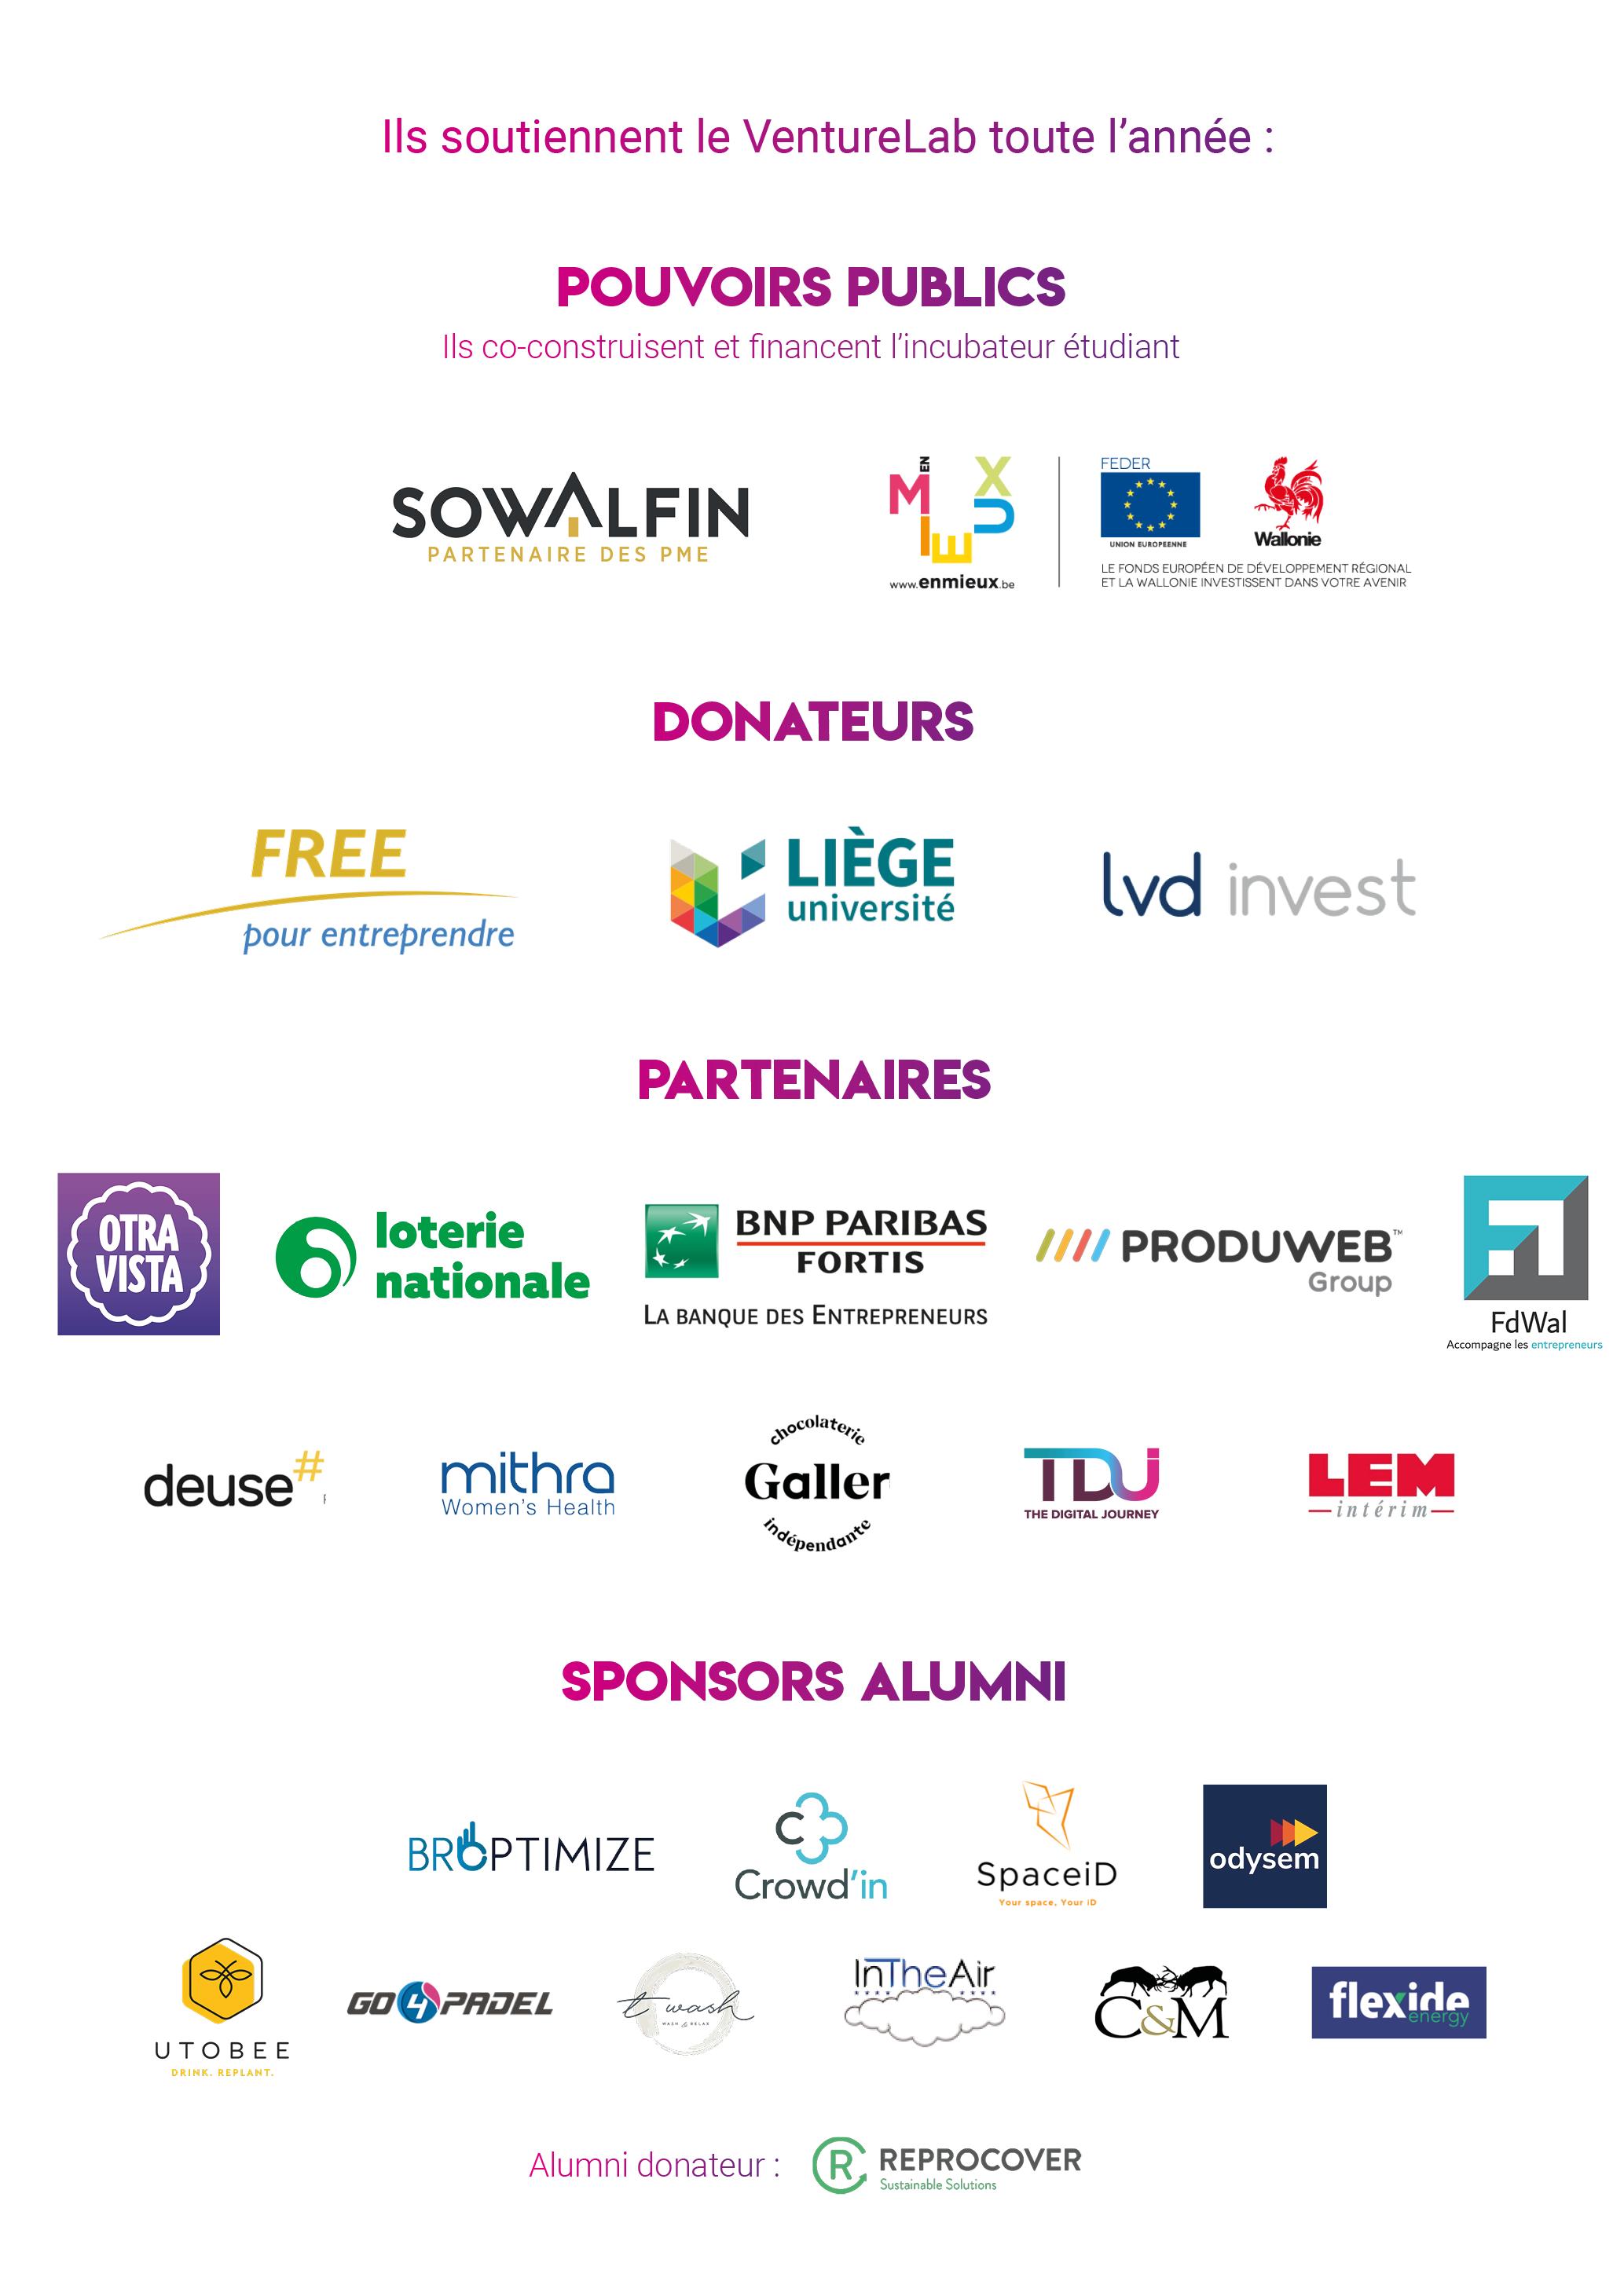 Les sponsors du VentureLab